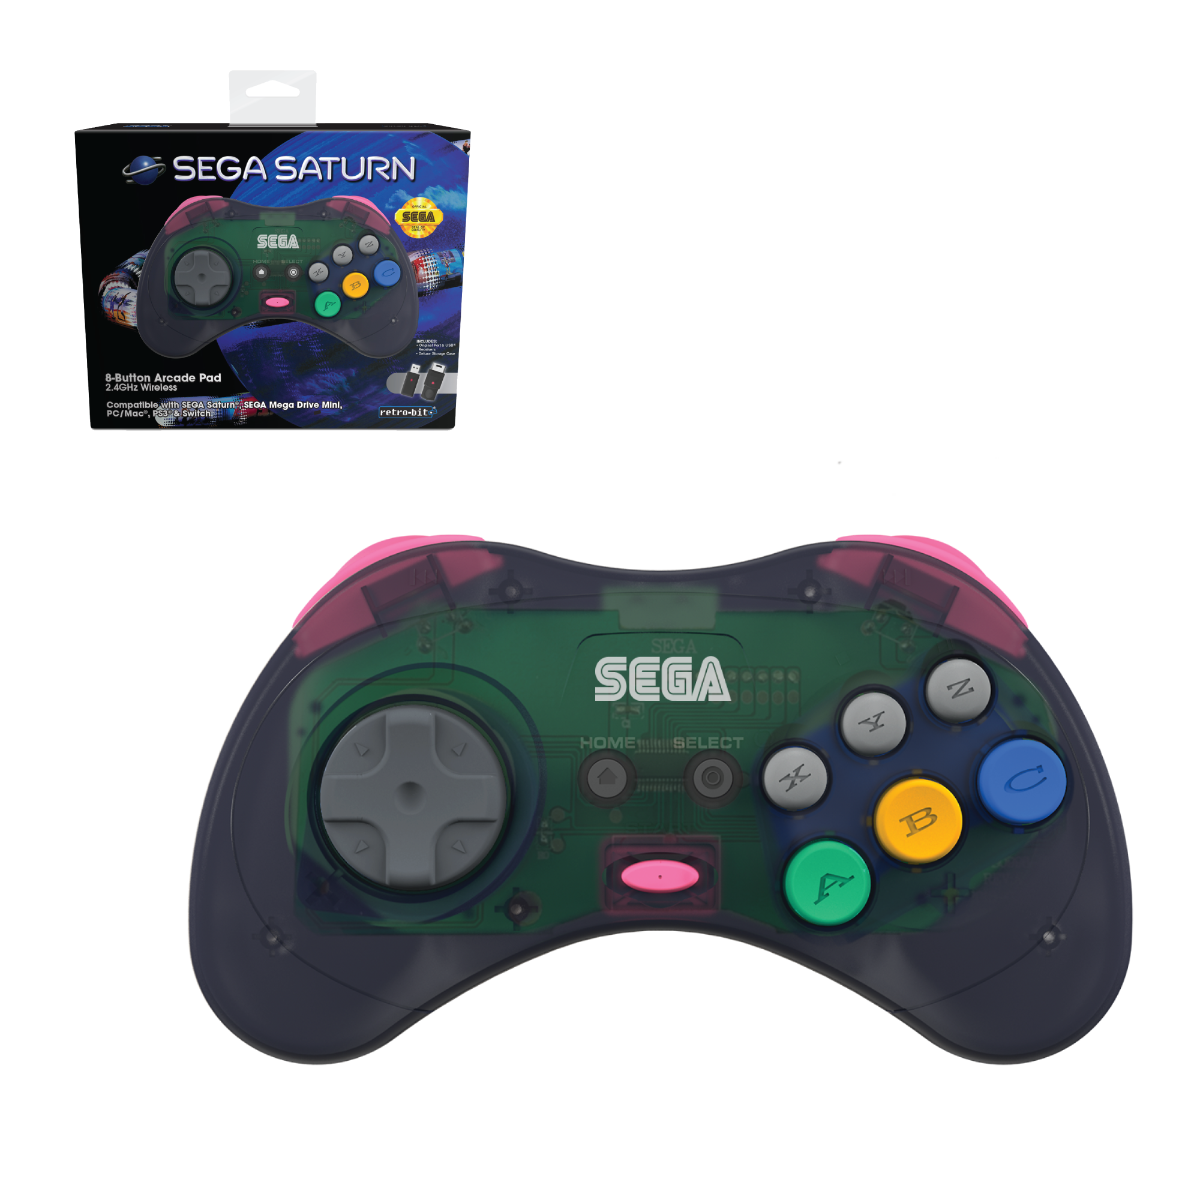 SEGA, Saturn, 8-Button, Arcade Pad, Controller, 2.4 GHz Wireless, USB, PC, Mac, PS3, Android, Genesis Mini, Switch, Slate Grey